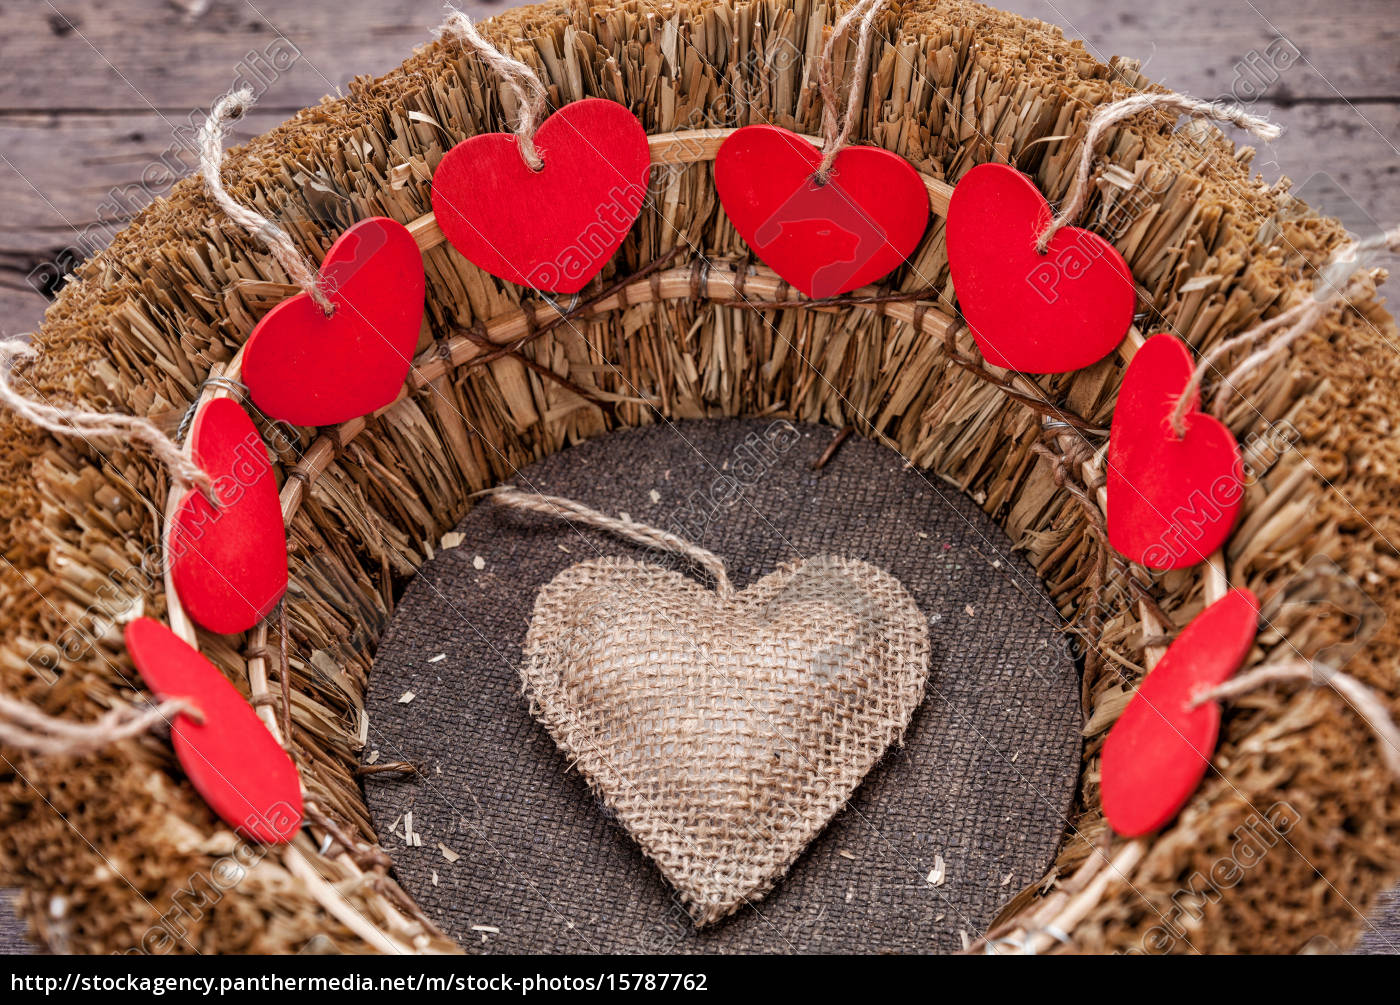 many, hearts, inside, a, wooden, basket - 15787762